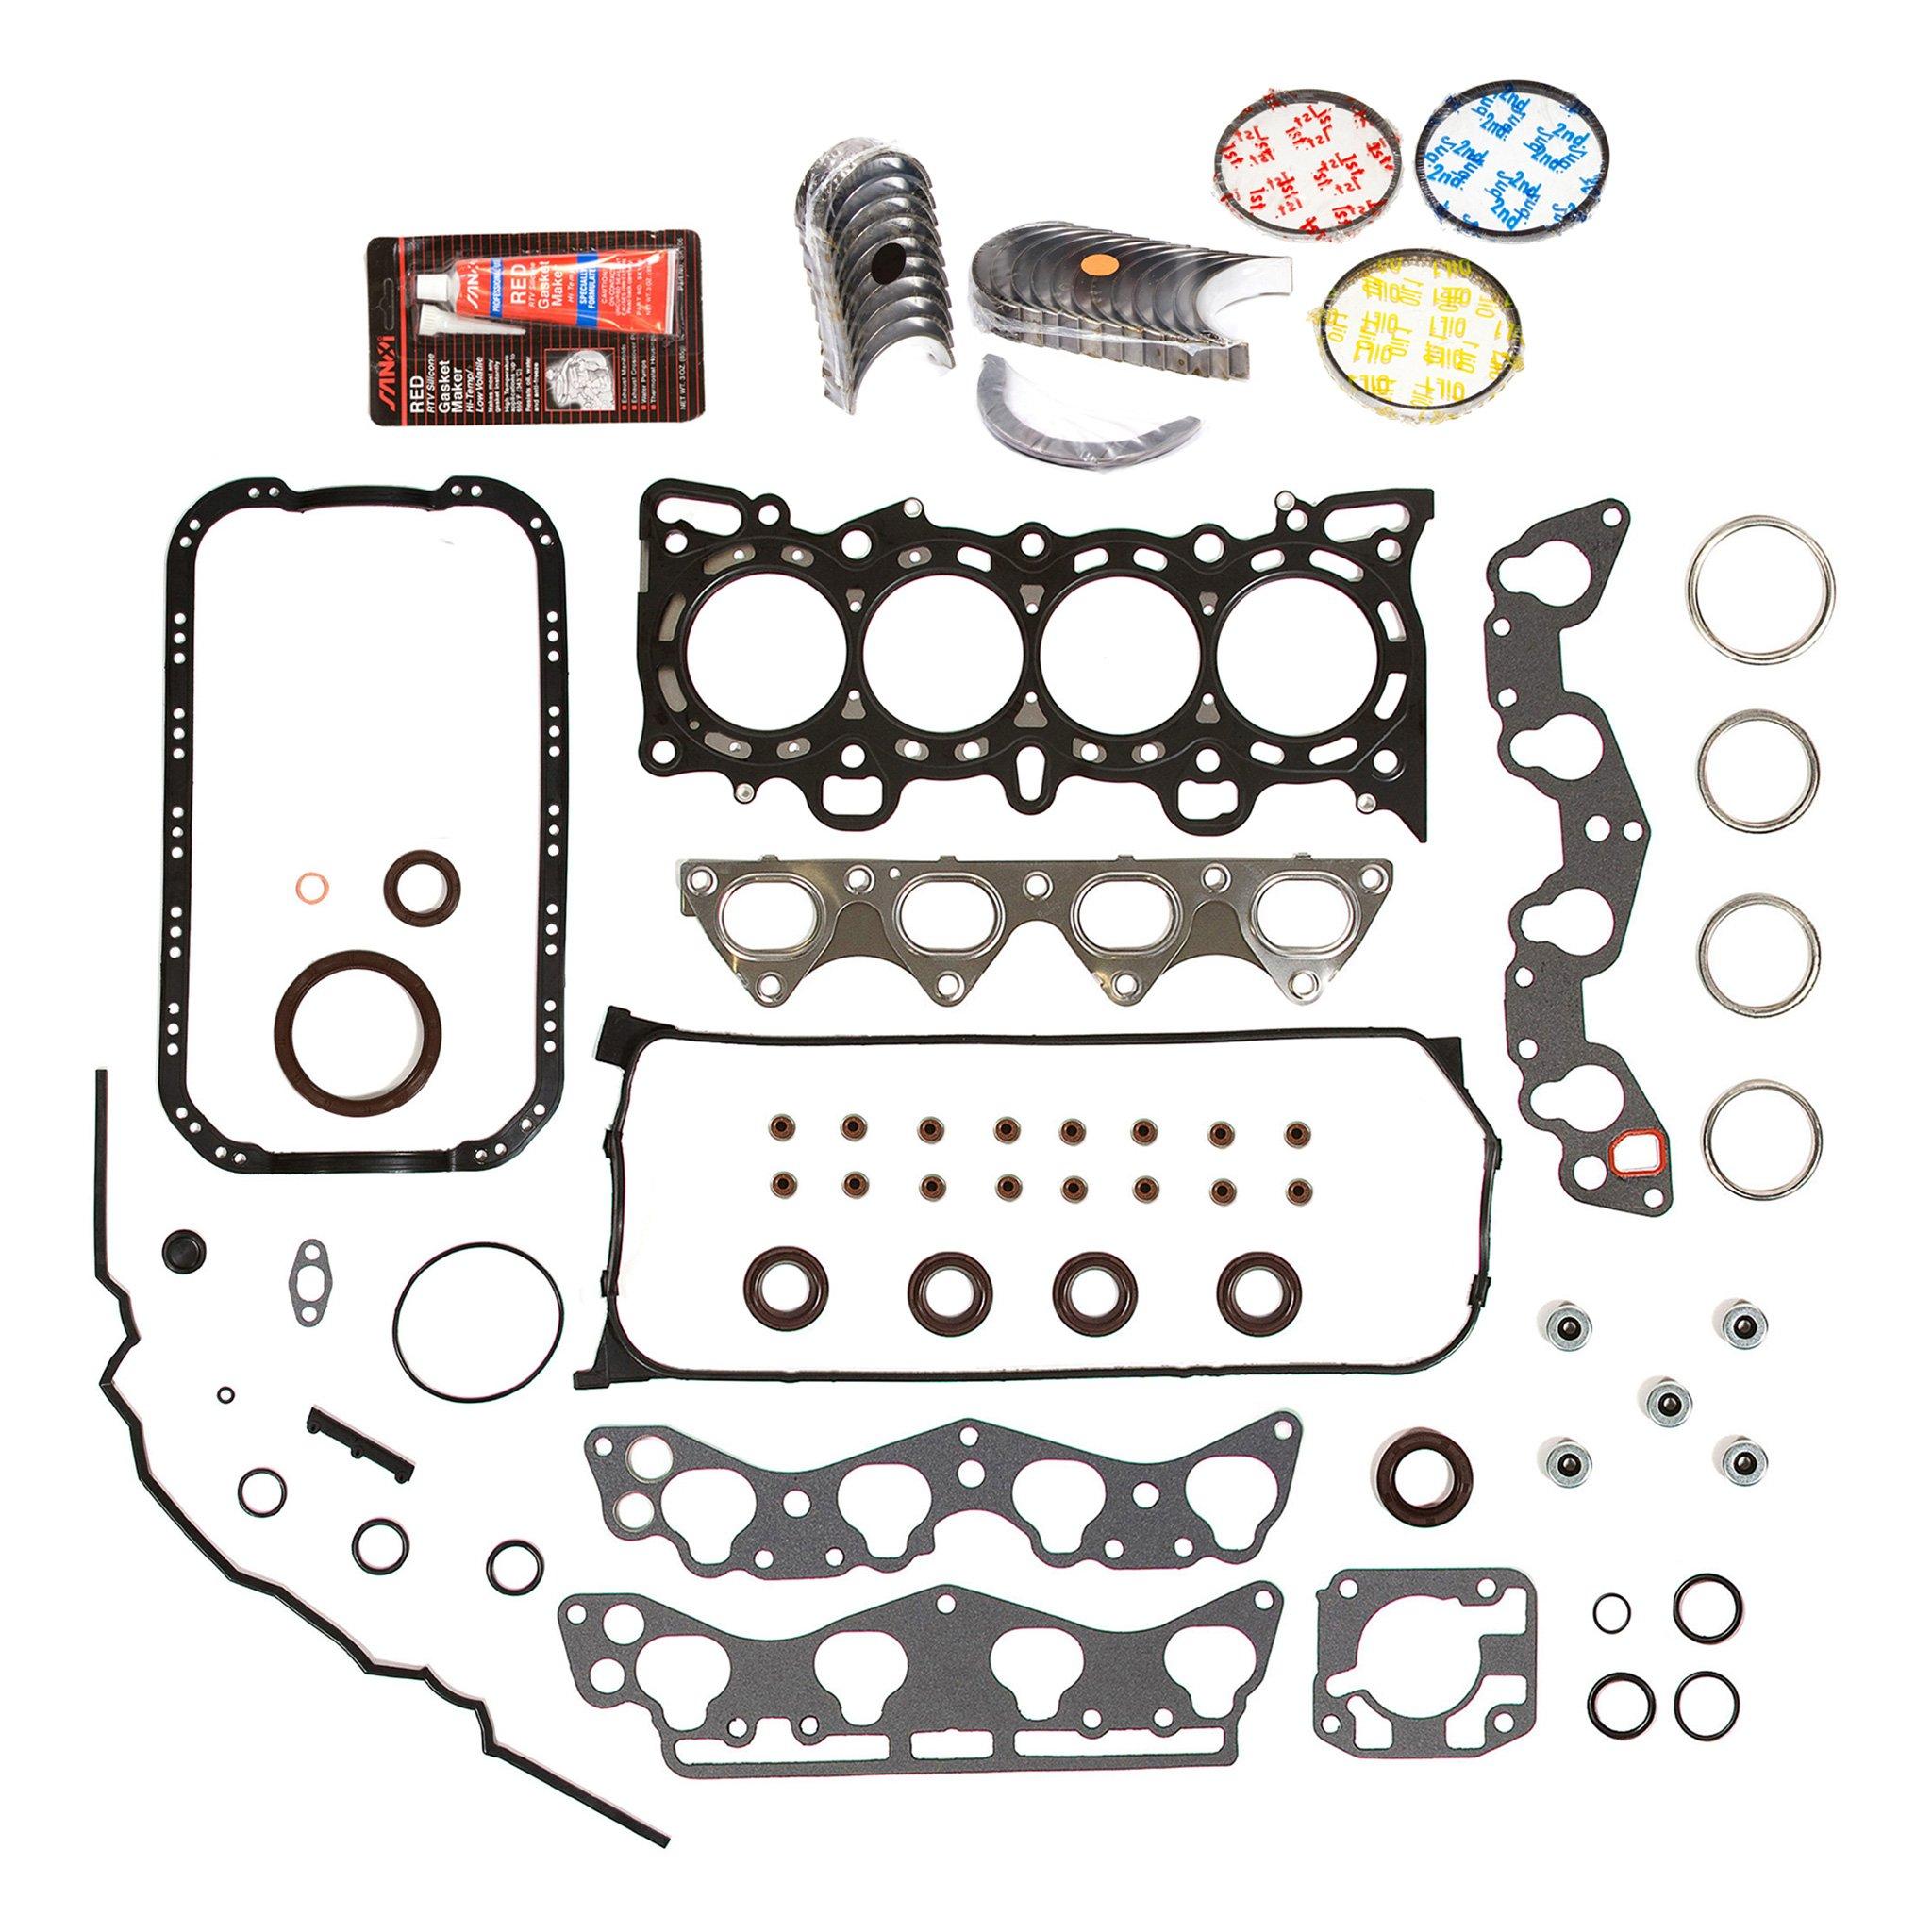 Evergreen Engine Rering Kit FSBRR4029EVE 96-00 Honda Civic 1.6 D16Y5 D16Y7 Full Gasket Set, 0.25mm / 0.010'' Oversize Main Rod Bearings, 0.50mm / 0.020'' Oversize Piston Rings by Evergreen Parts And Components